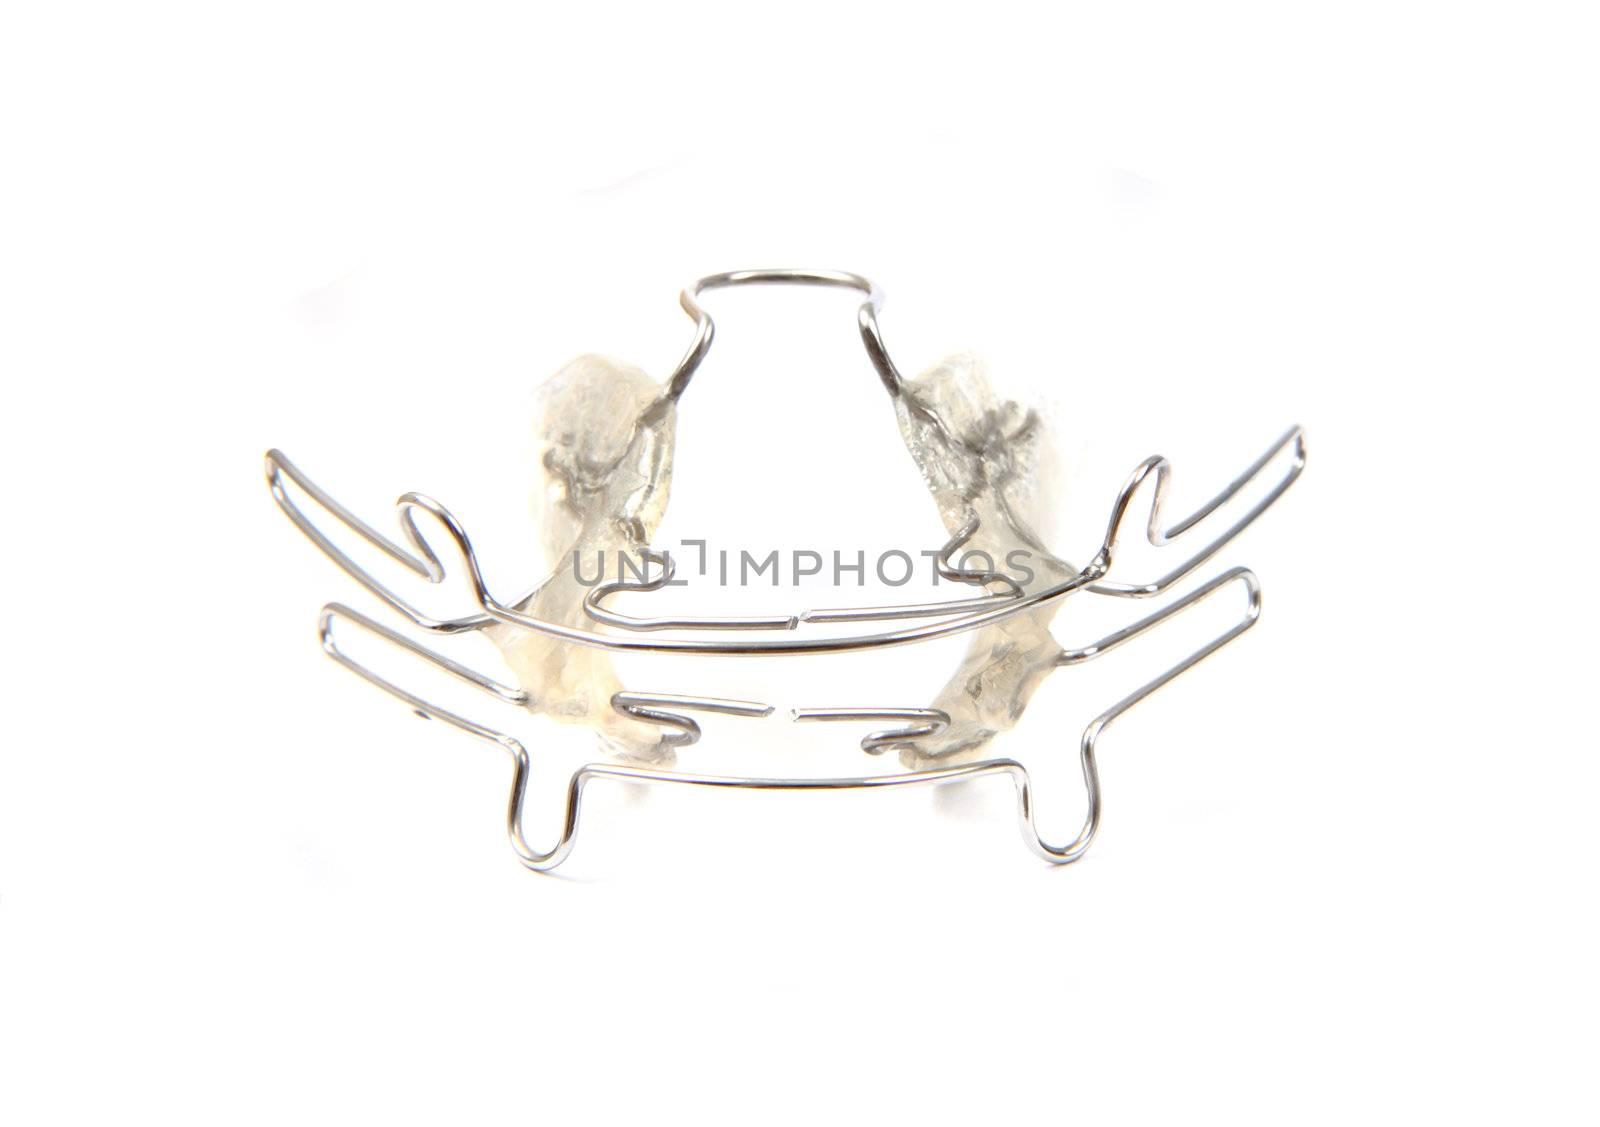 braces (orthodontic tool)  by jonnysek